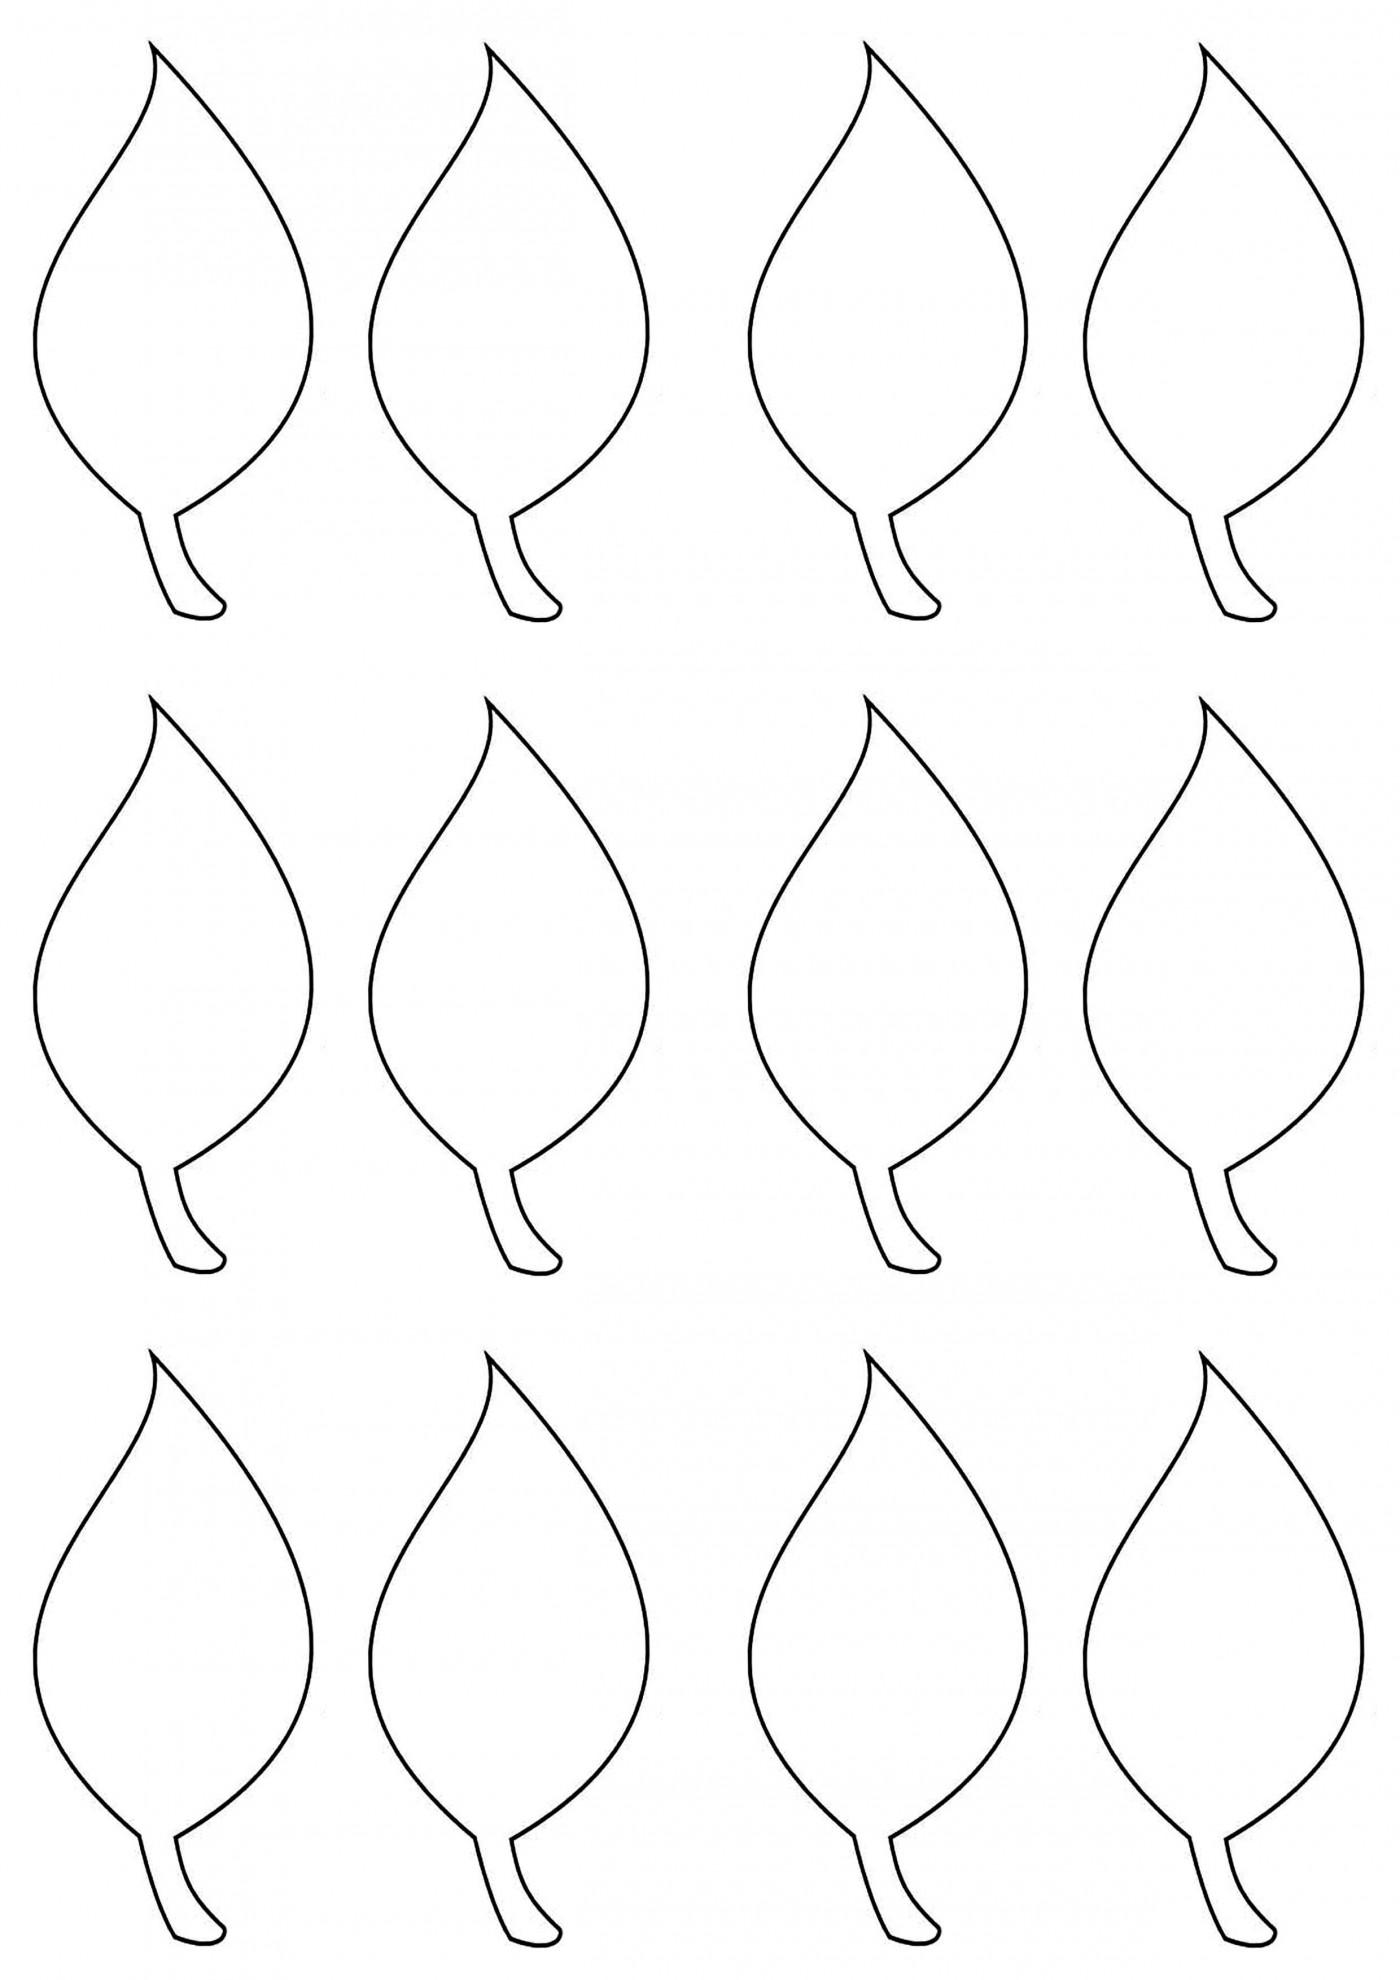 002 Impressive Blank Leaf Template With Line Image  Printable1400